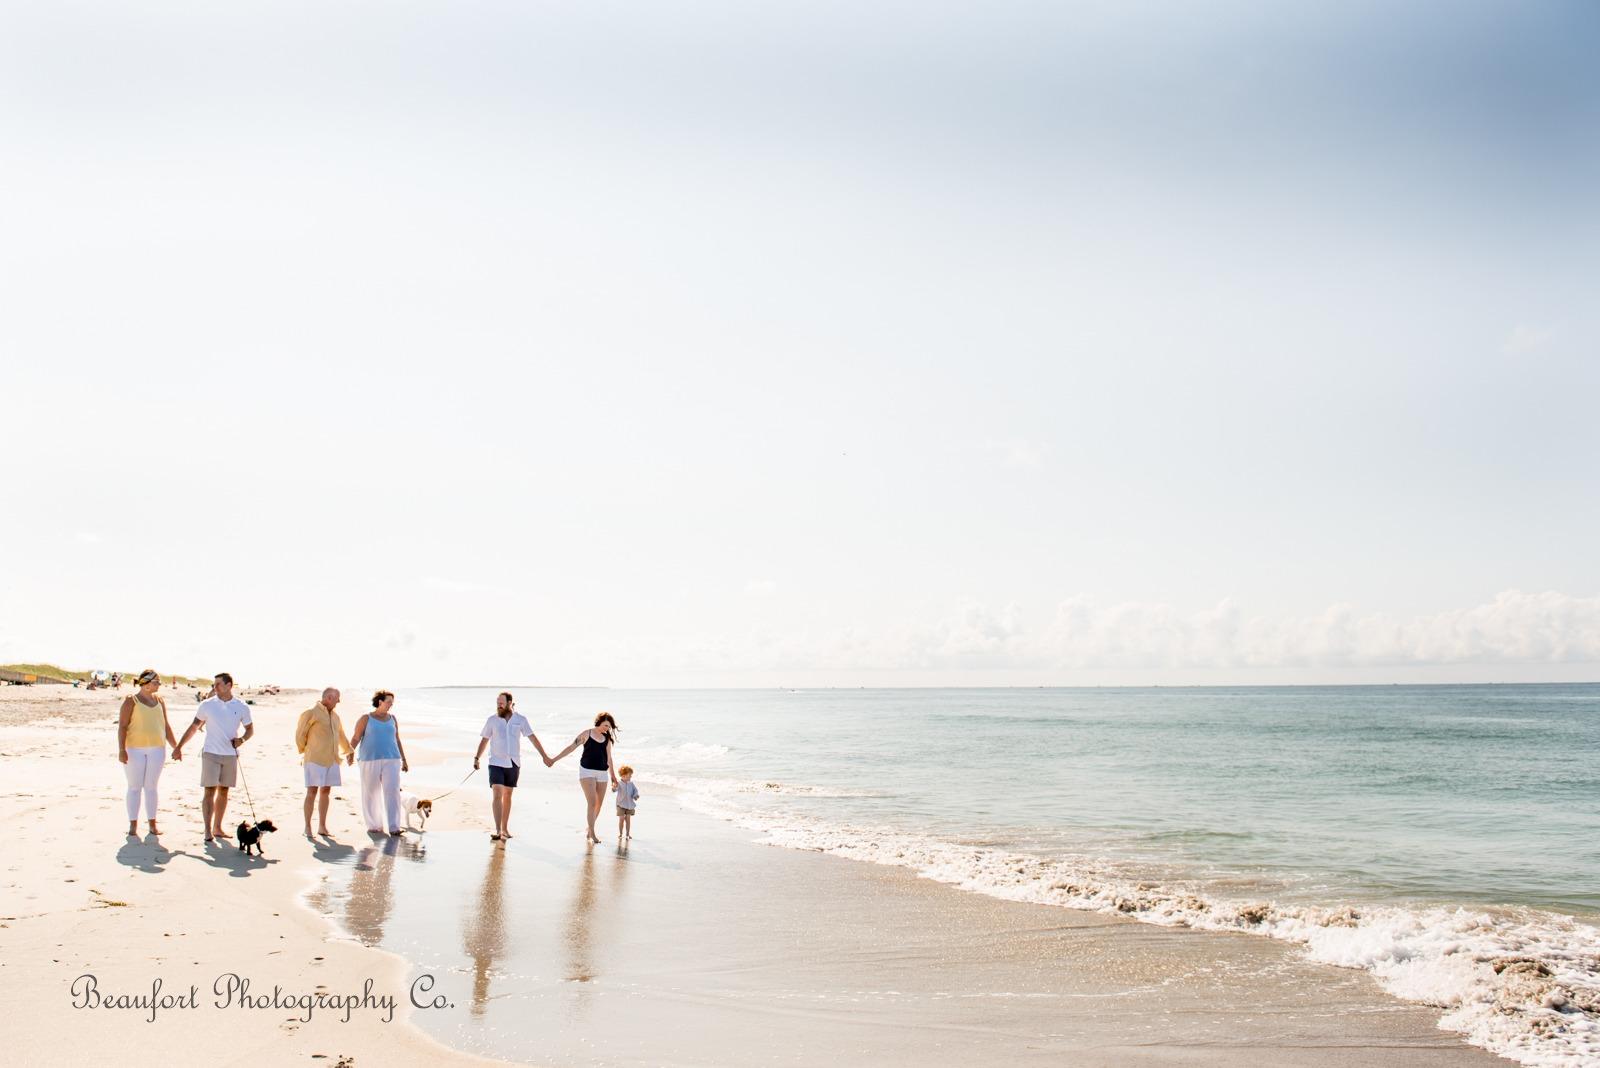 Beaufort Photography Co. lifestyle family portrait Beaufort Crystal Coast beach photo